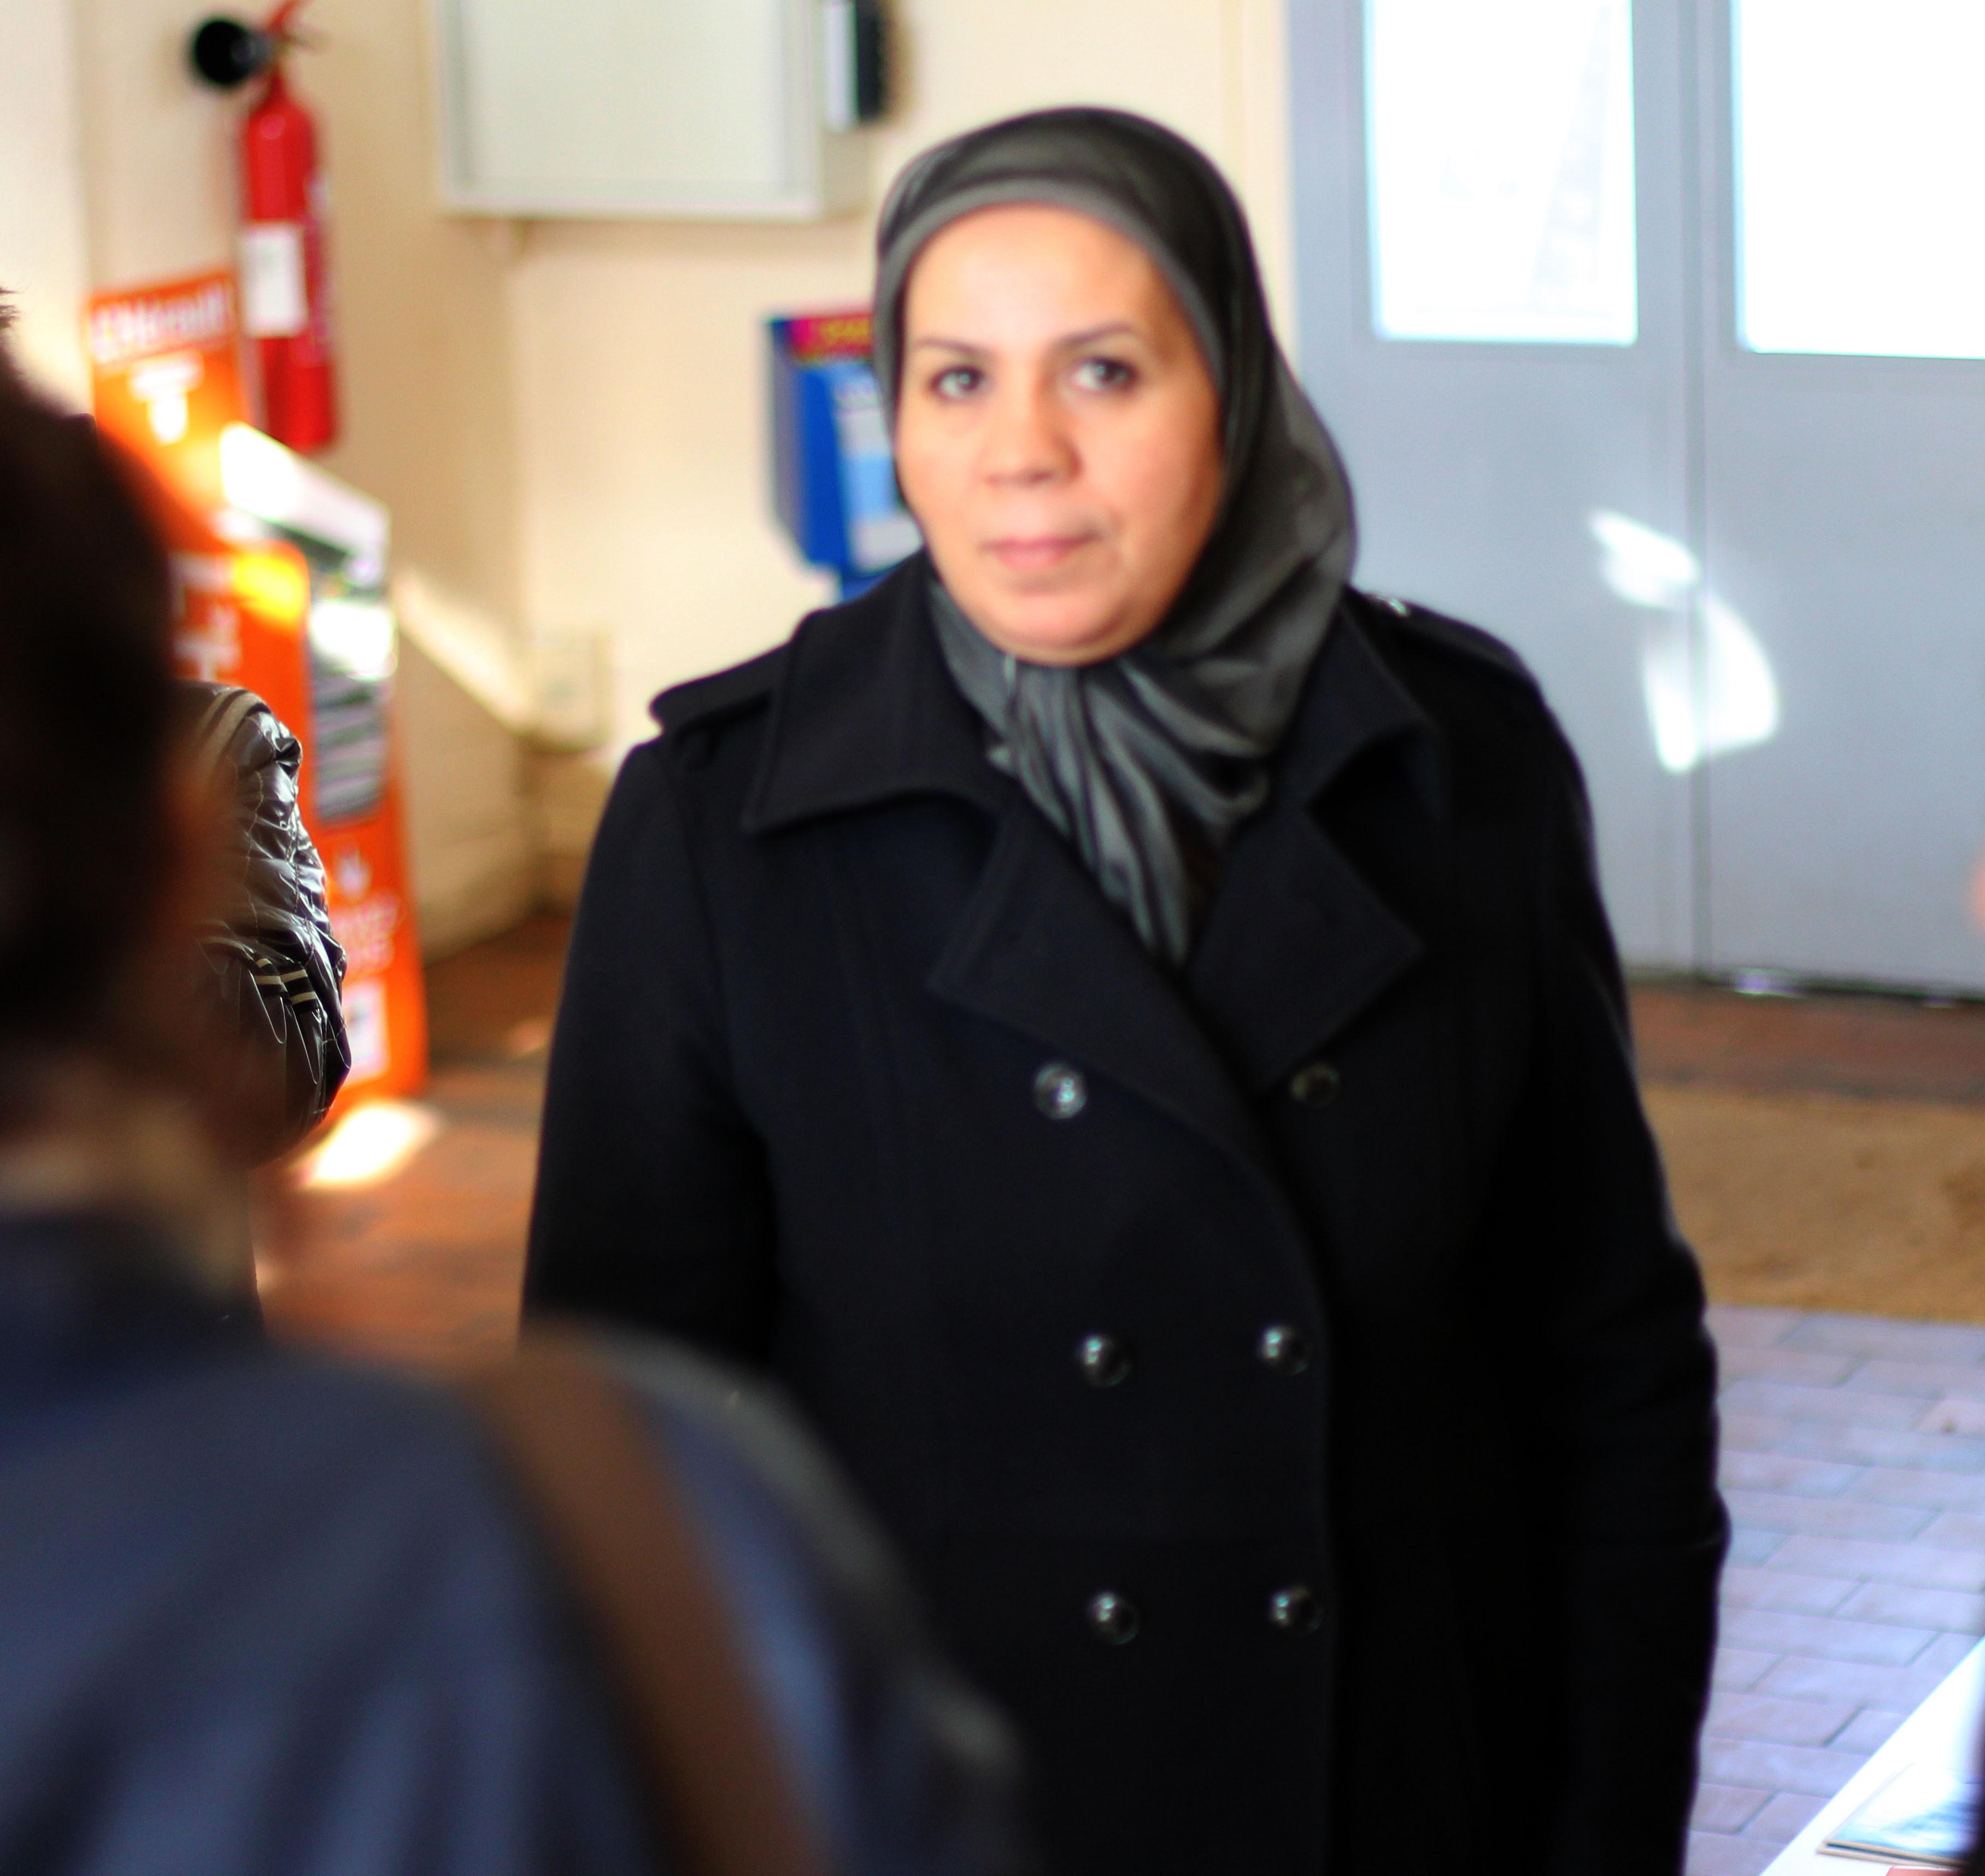 Latifa Ibn Ziaten en 2013 à Montpellier. Par Fouzia Abdellaoui  [CC BY-SA 3.0], via Wikimedia Commons